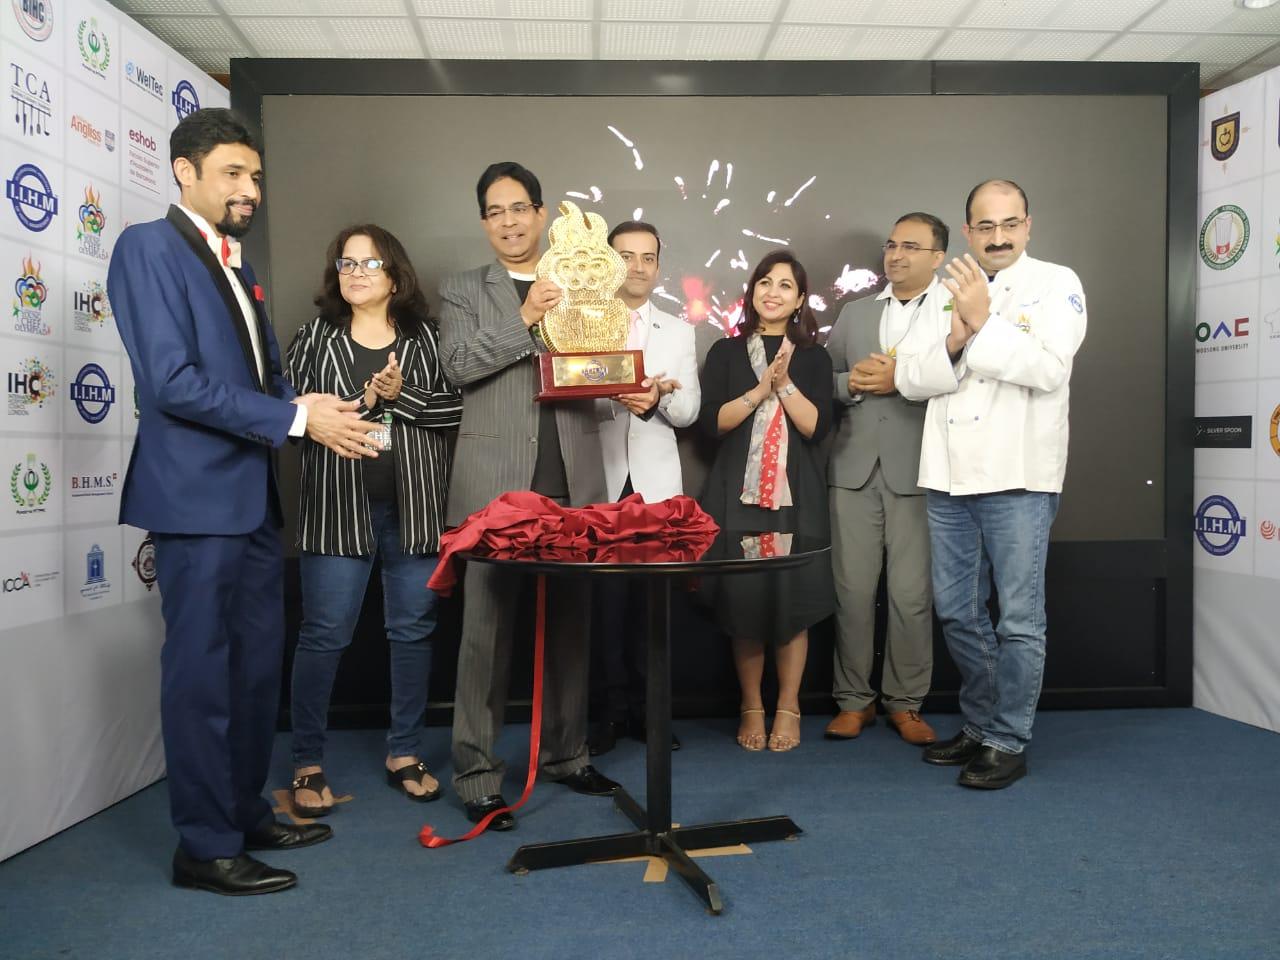 Suborno Bose, chairman, YCO Global Council and IIHM campus directors with the YCO Trophy. Image Source: IIHM